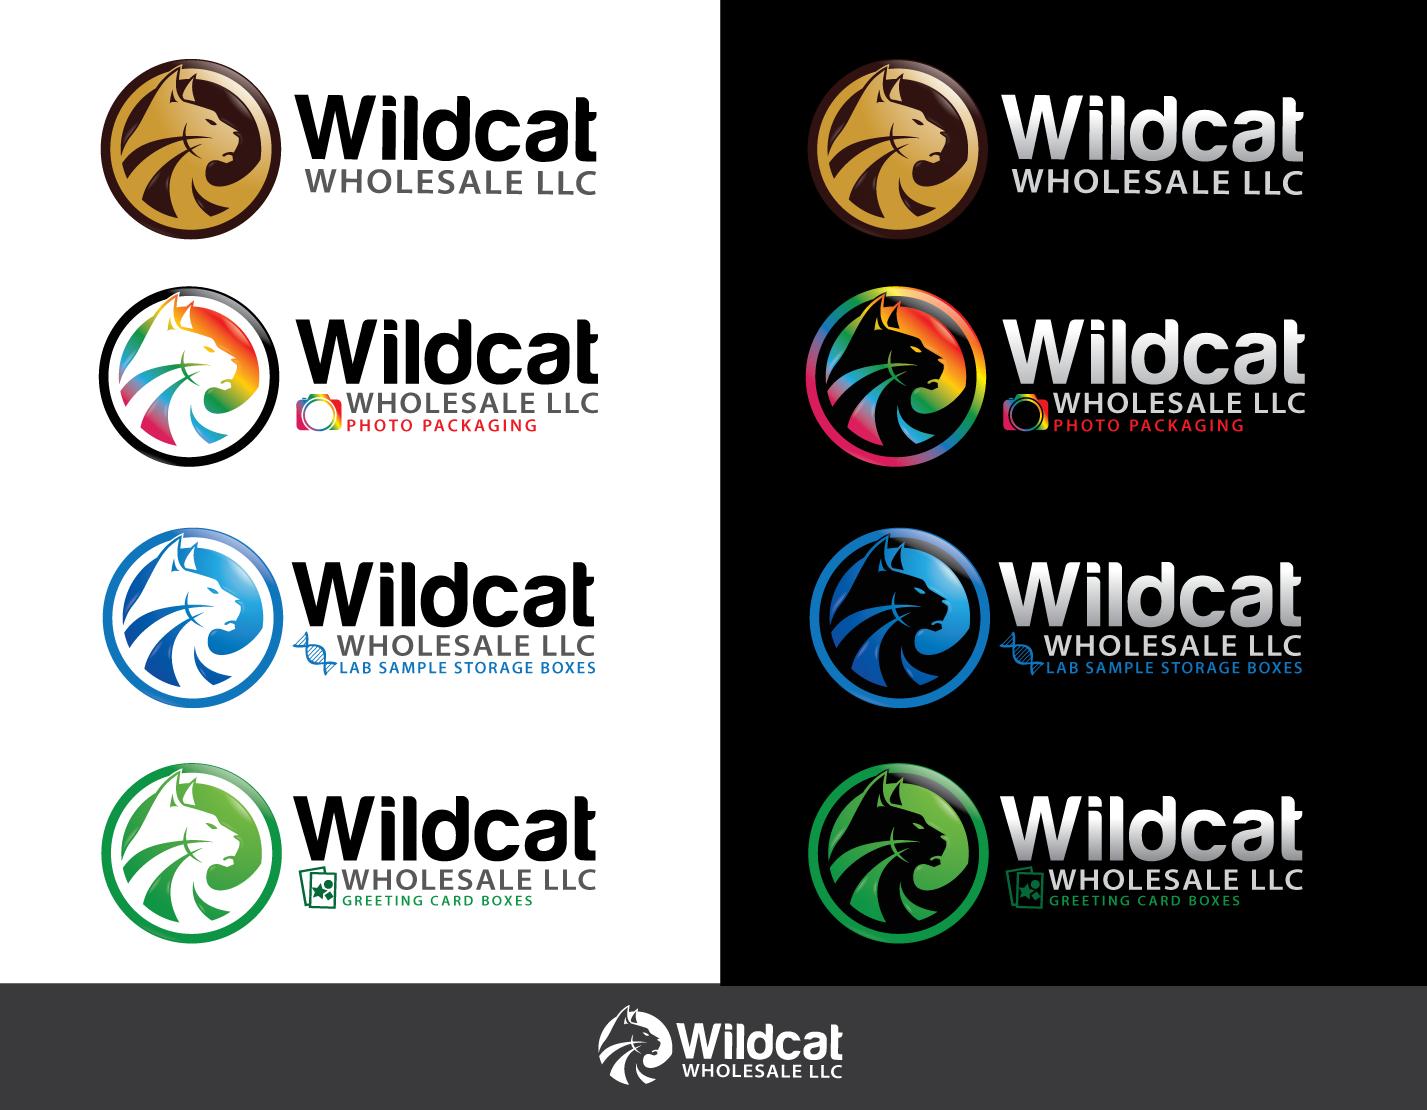 Create the next logo for Wildcat Wholesale LLC